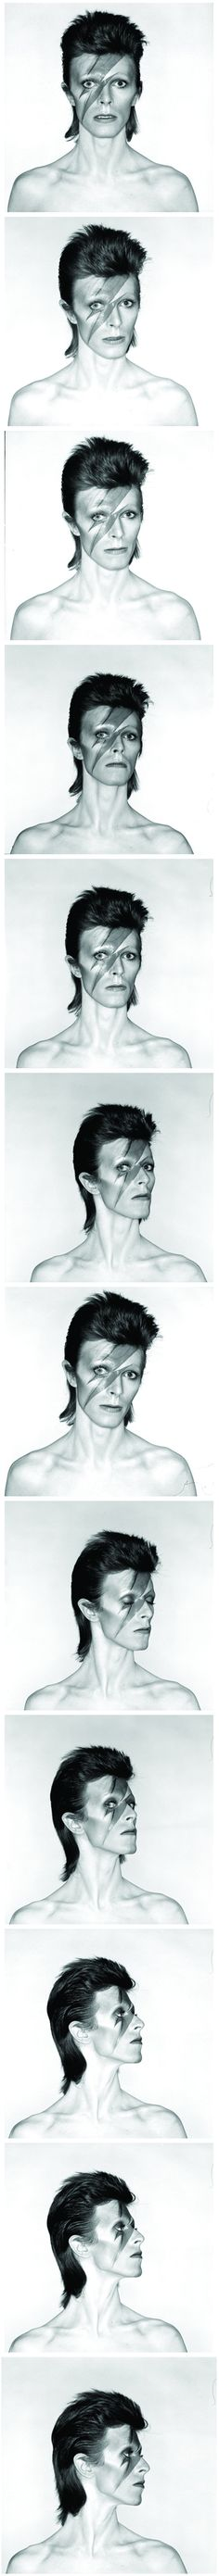 "David Bowie's ""Aladdin Sane"" Photo-shoot by Brian Duffy, 1973"